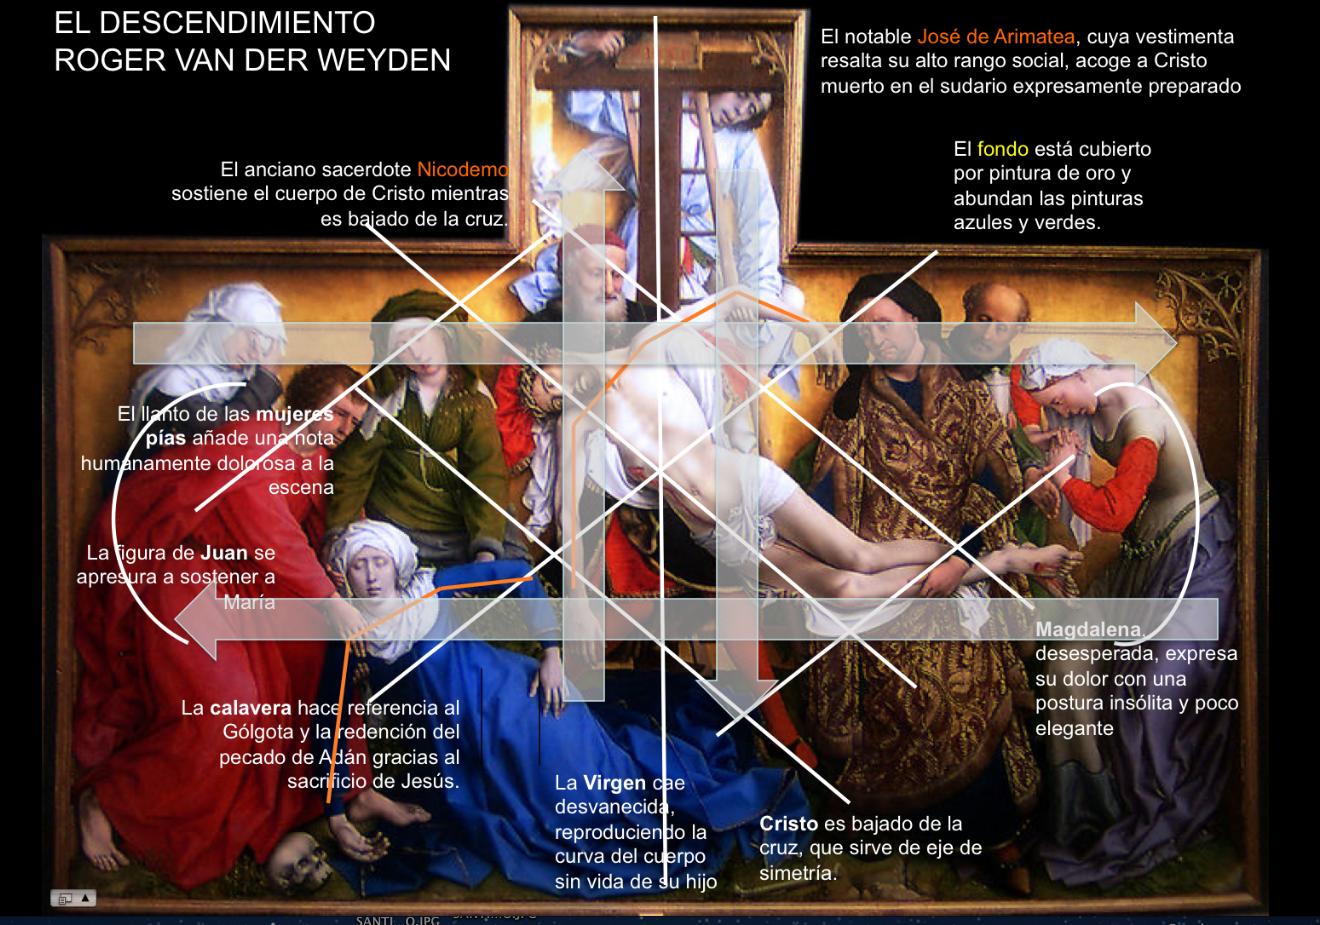 https://arthisgeovaliente.files.wordpress.com/2014/03/el-descendimiento-weyden.png